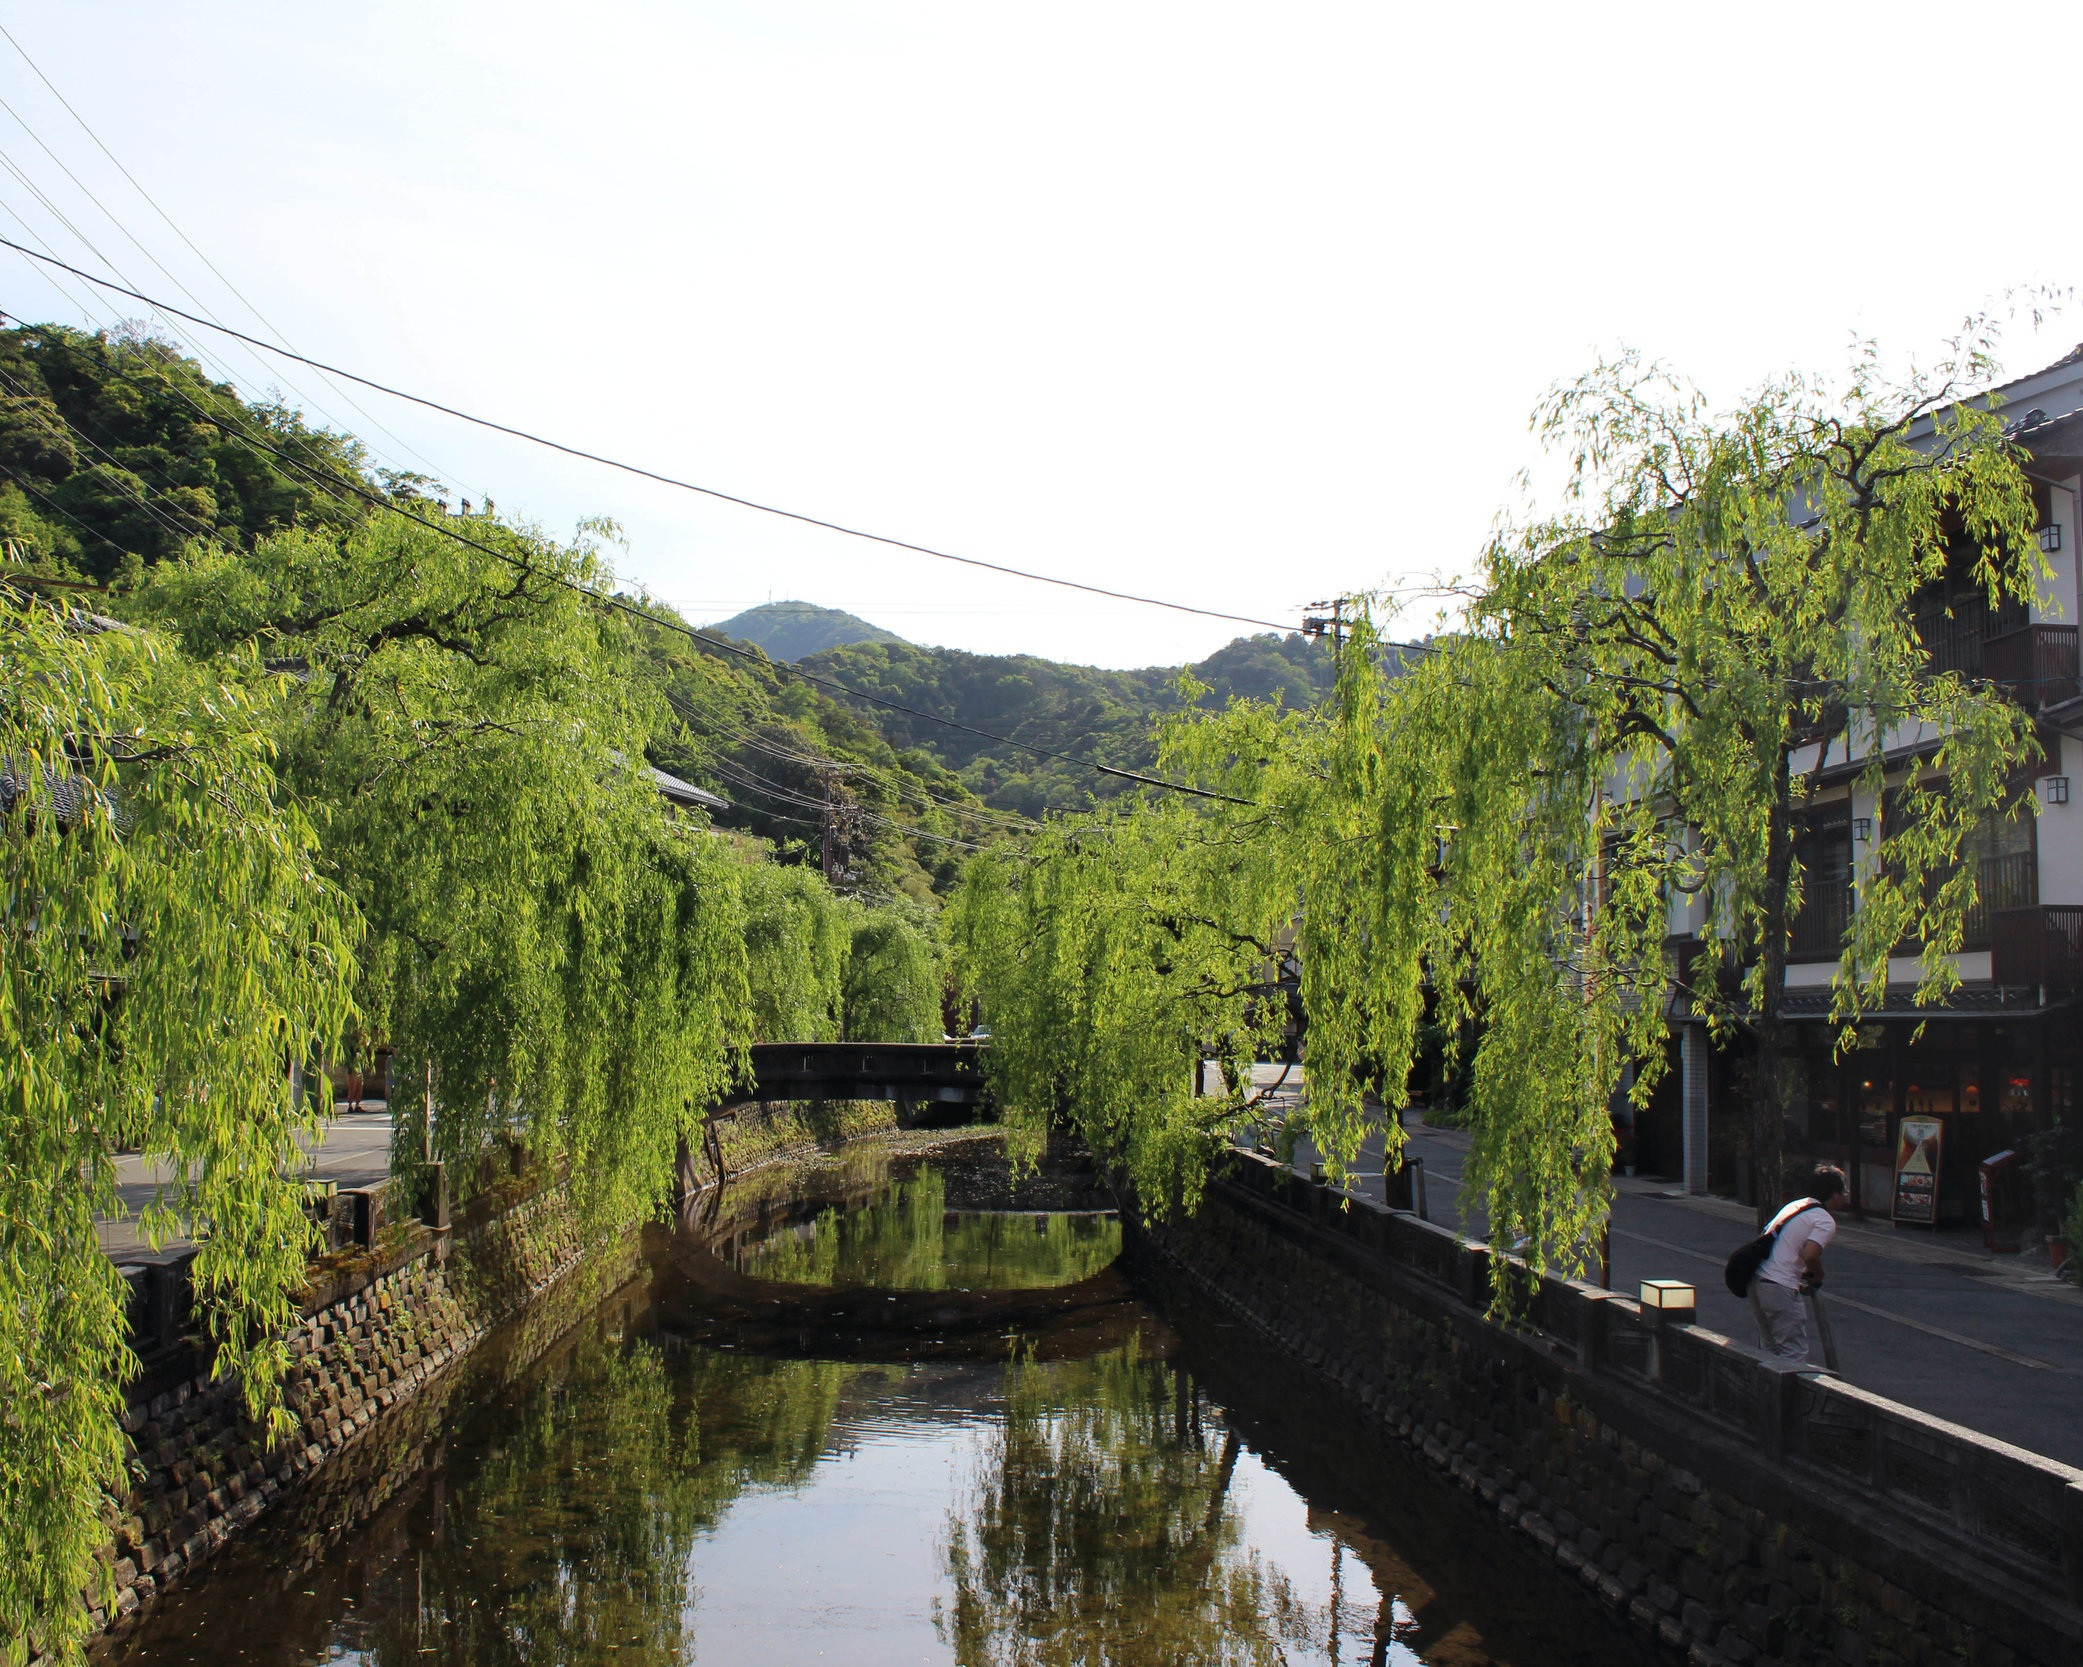 Kinosaki's willow-linked streets along the Otani-gawa River